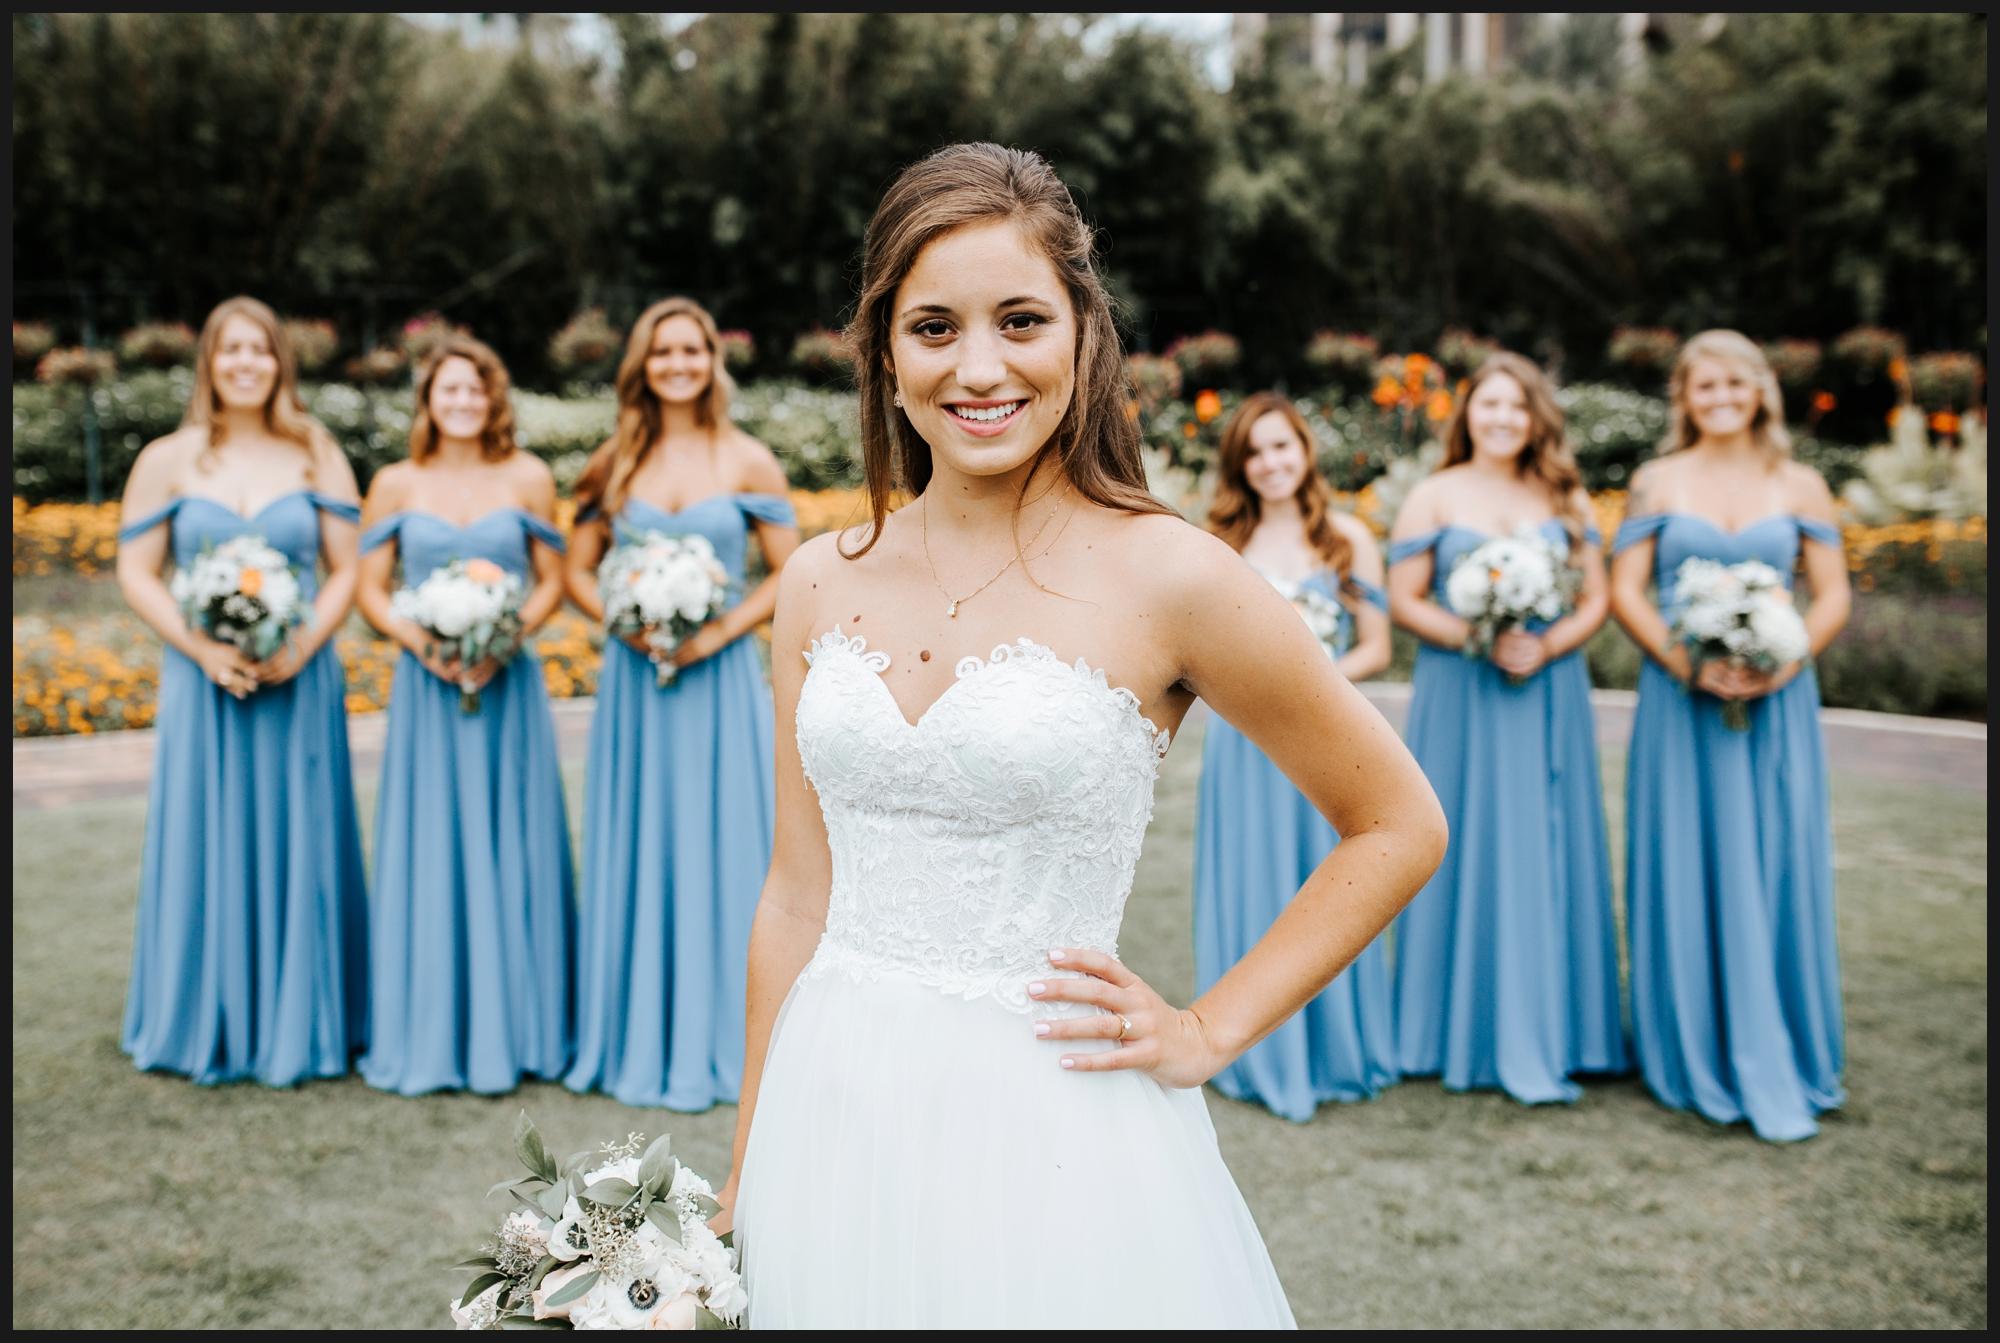 Orlando-Wedding-Photographer-destination-wedding-photographer-florida-wedding-photographer-bohemian-wedding-photographer_0034.jpg